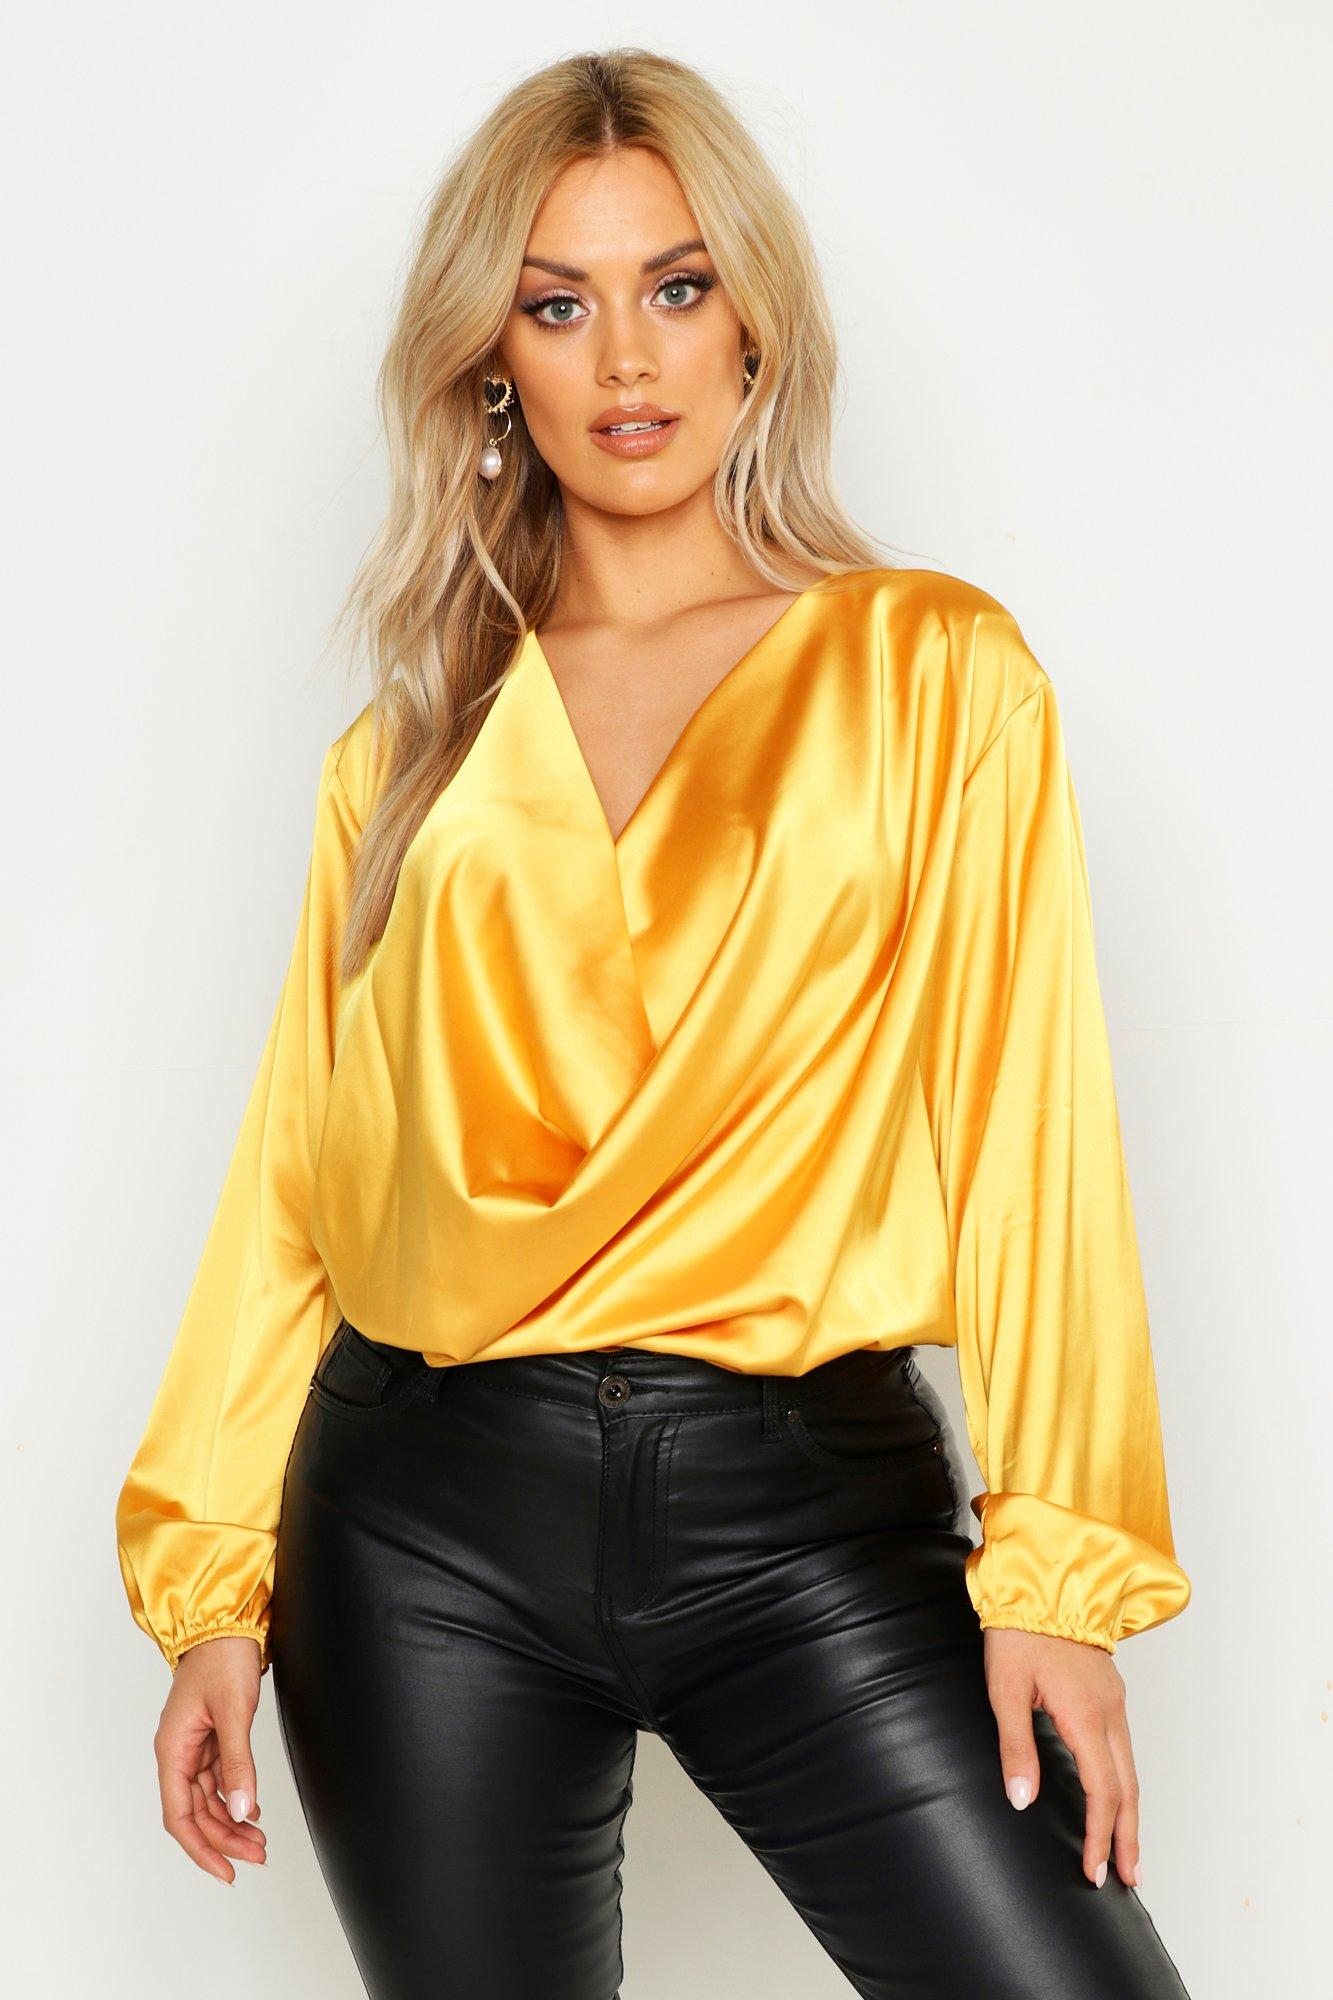 Vintage Tops & Retro Shirts, Halter Tops, Blouses Womens Plus Satin Cowl Long Sleeve Blouse - yellow - 16 $40.00 AT vintagedancer.com